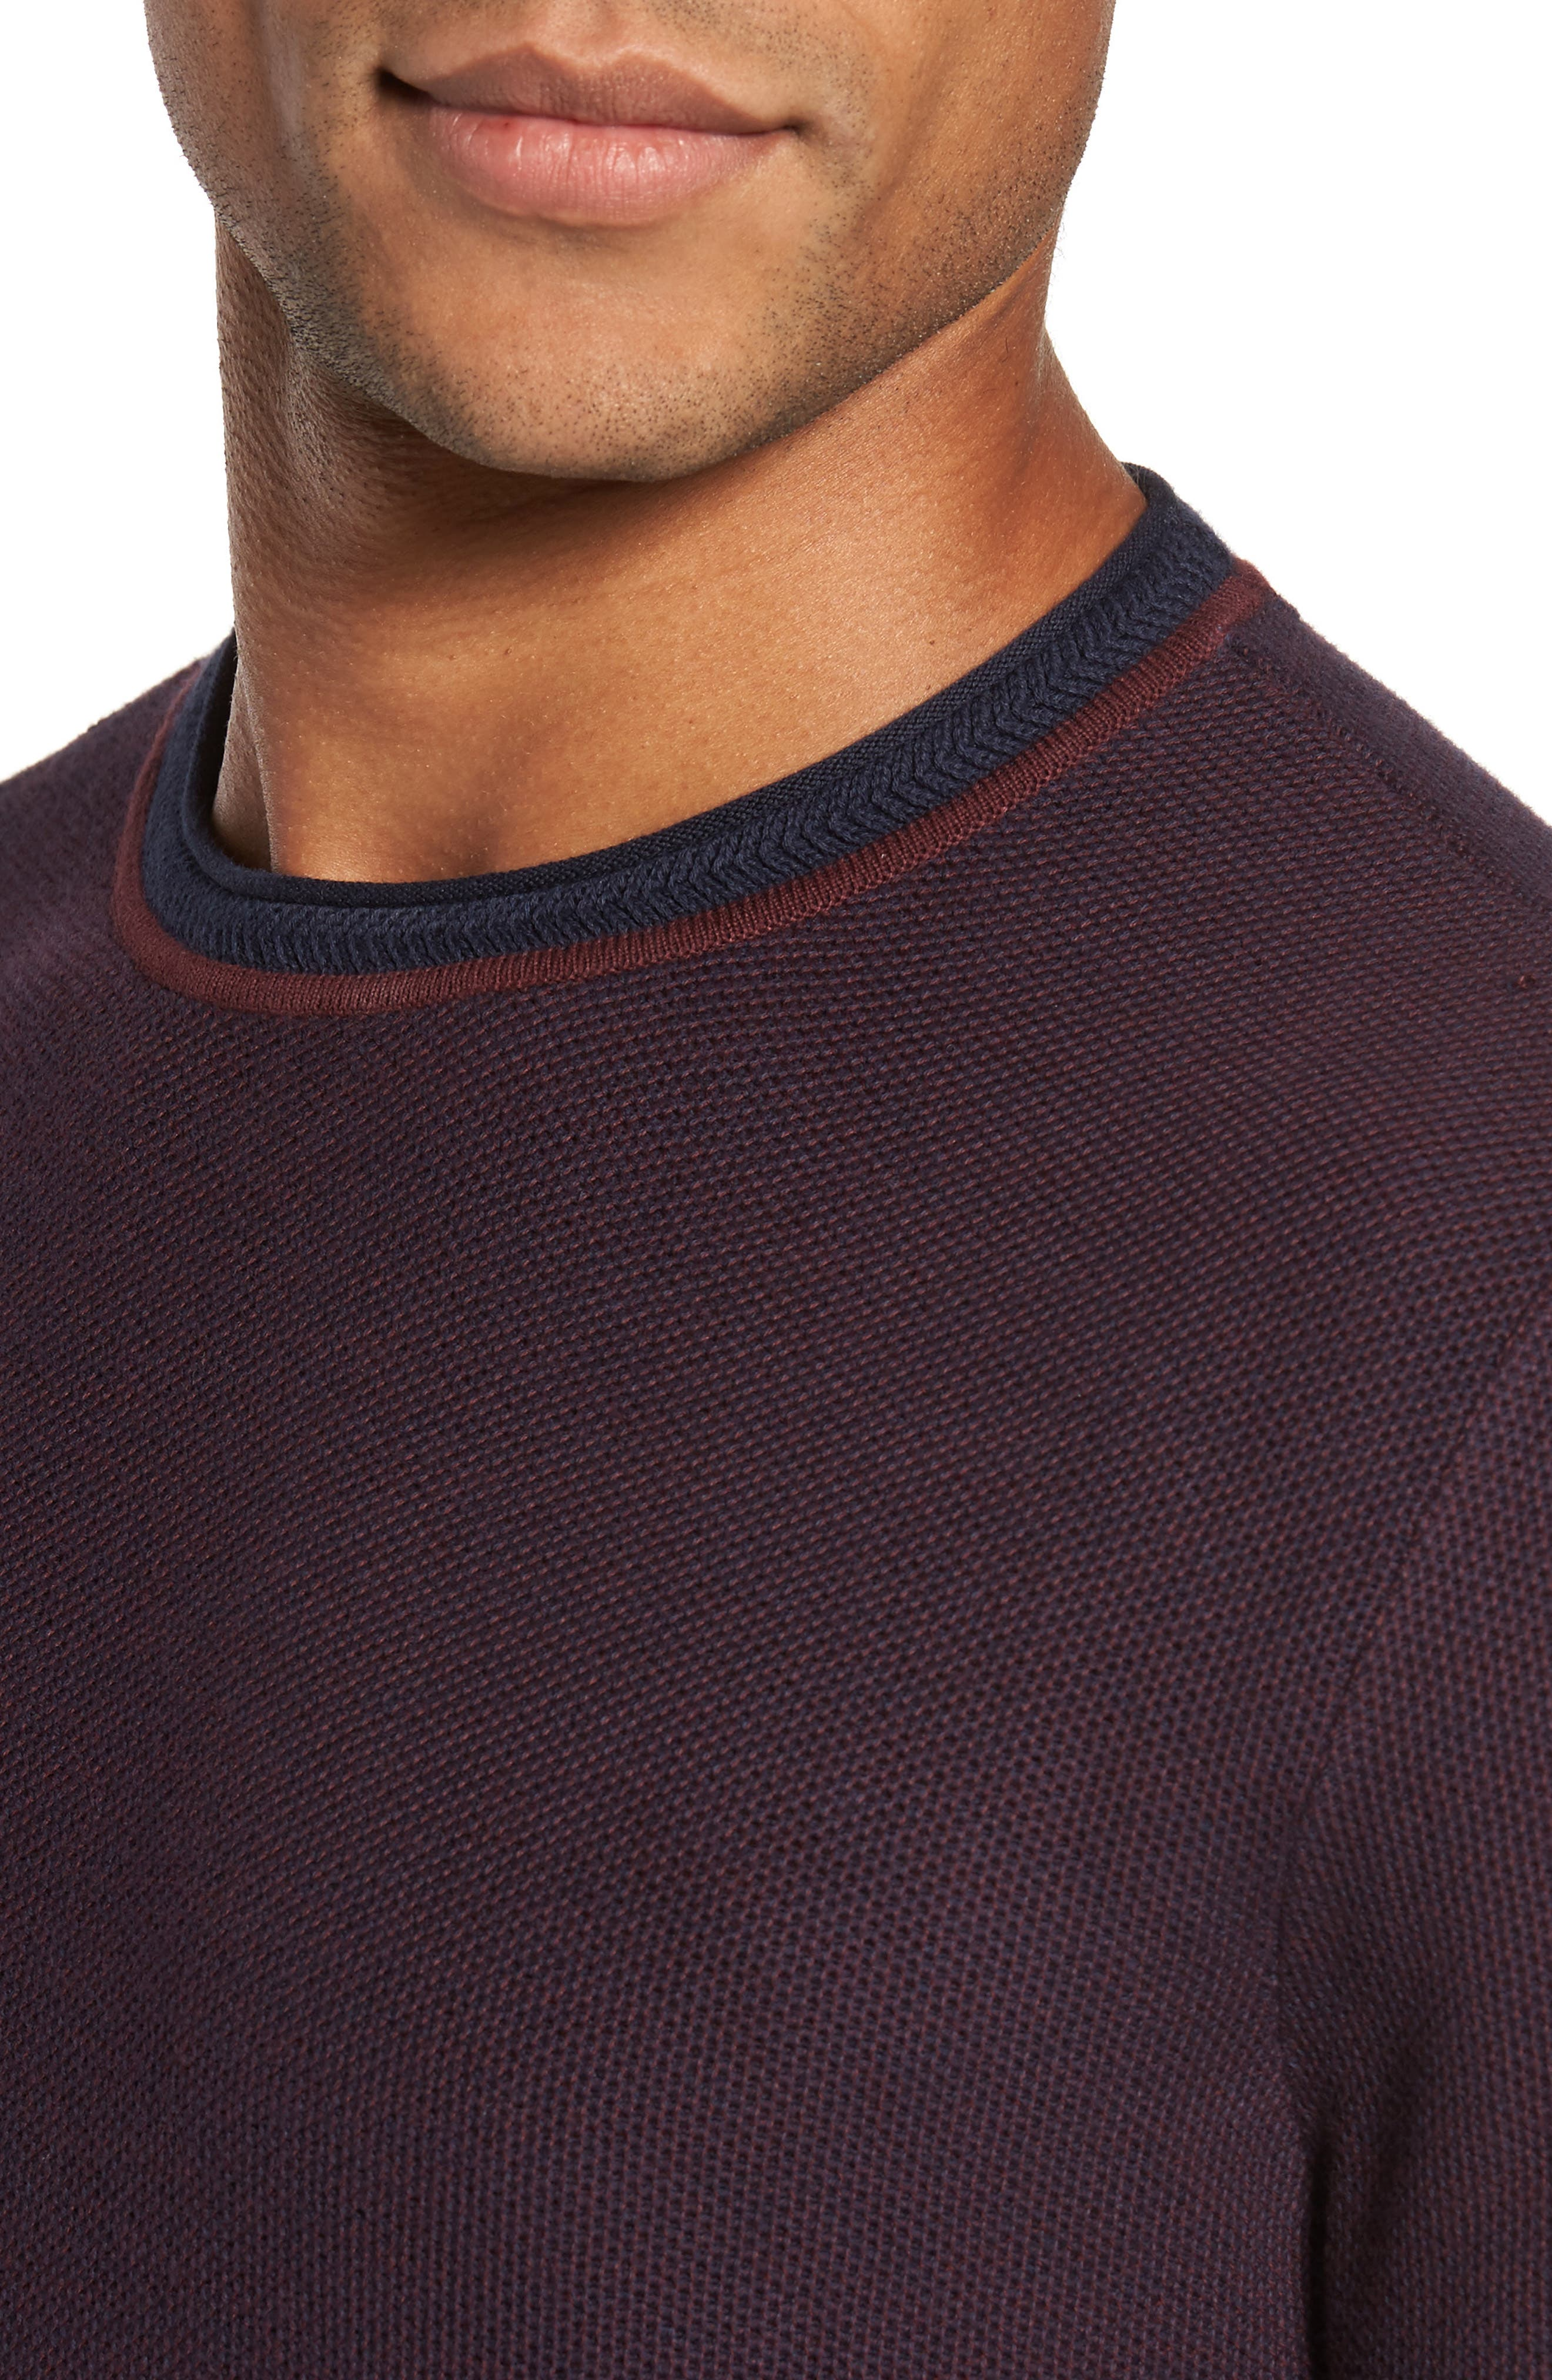 Space Dye Slim Fit Sweater,                             Alternate thumbnail 12, color,